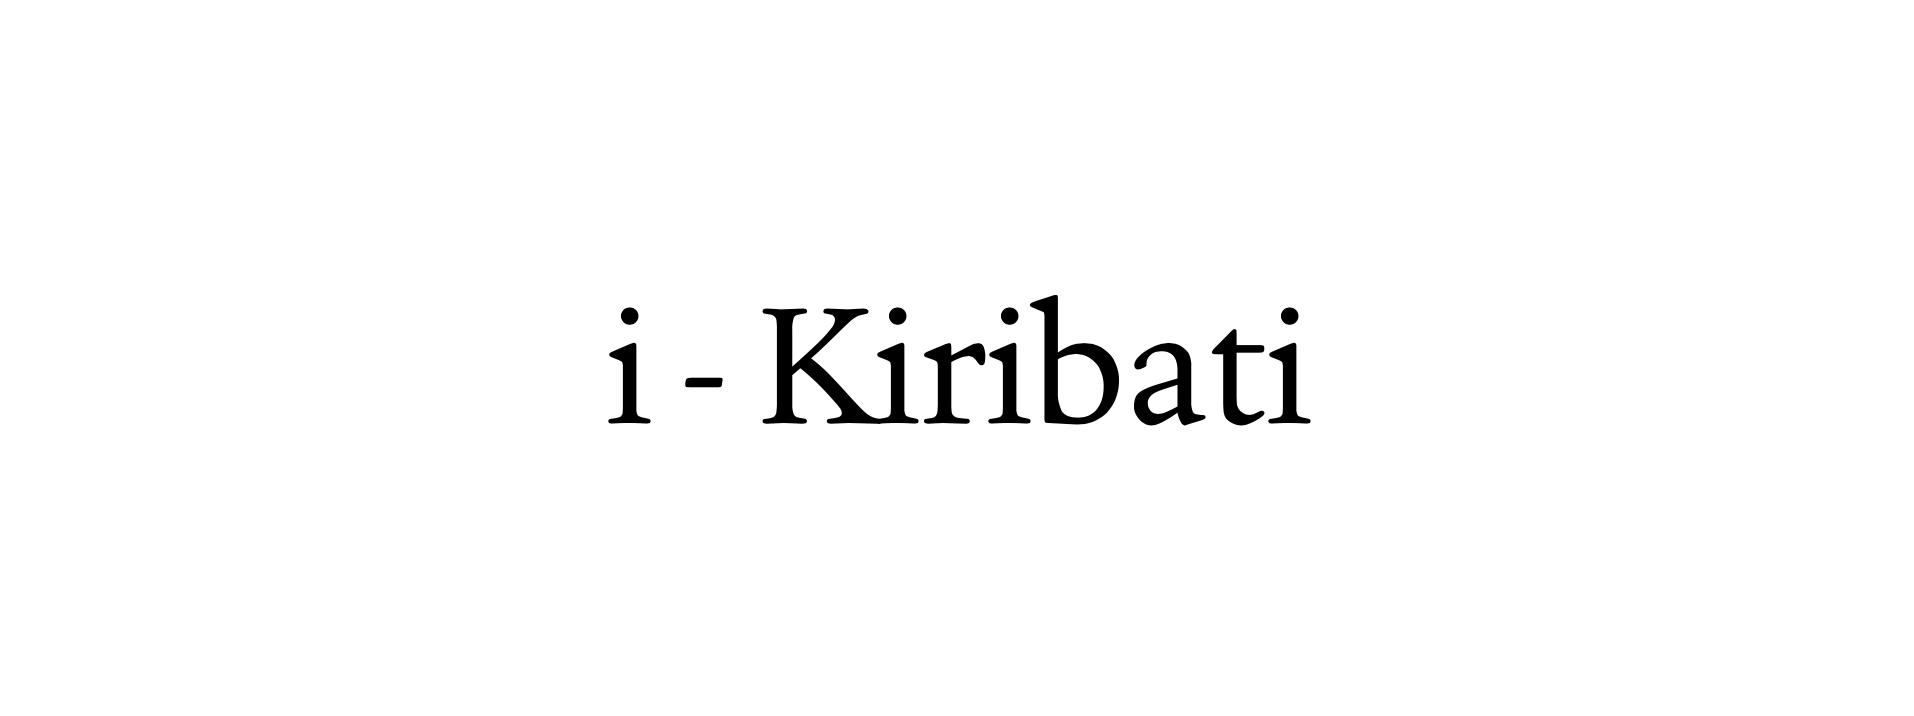 i-Kiribati word